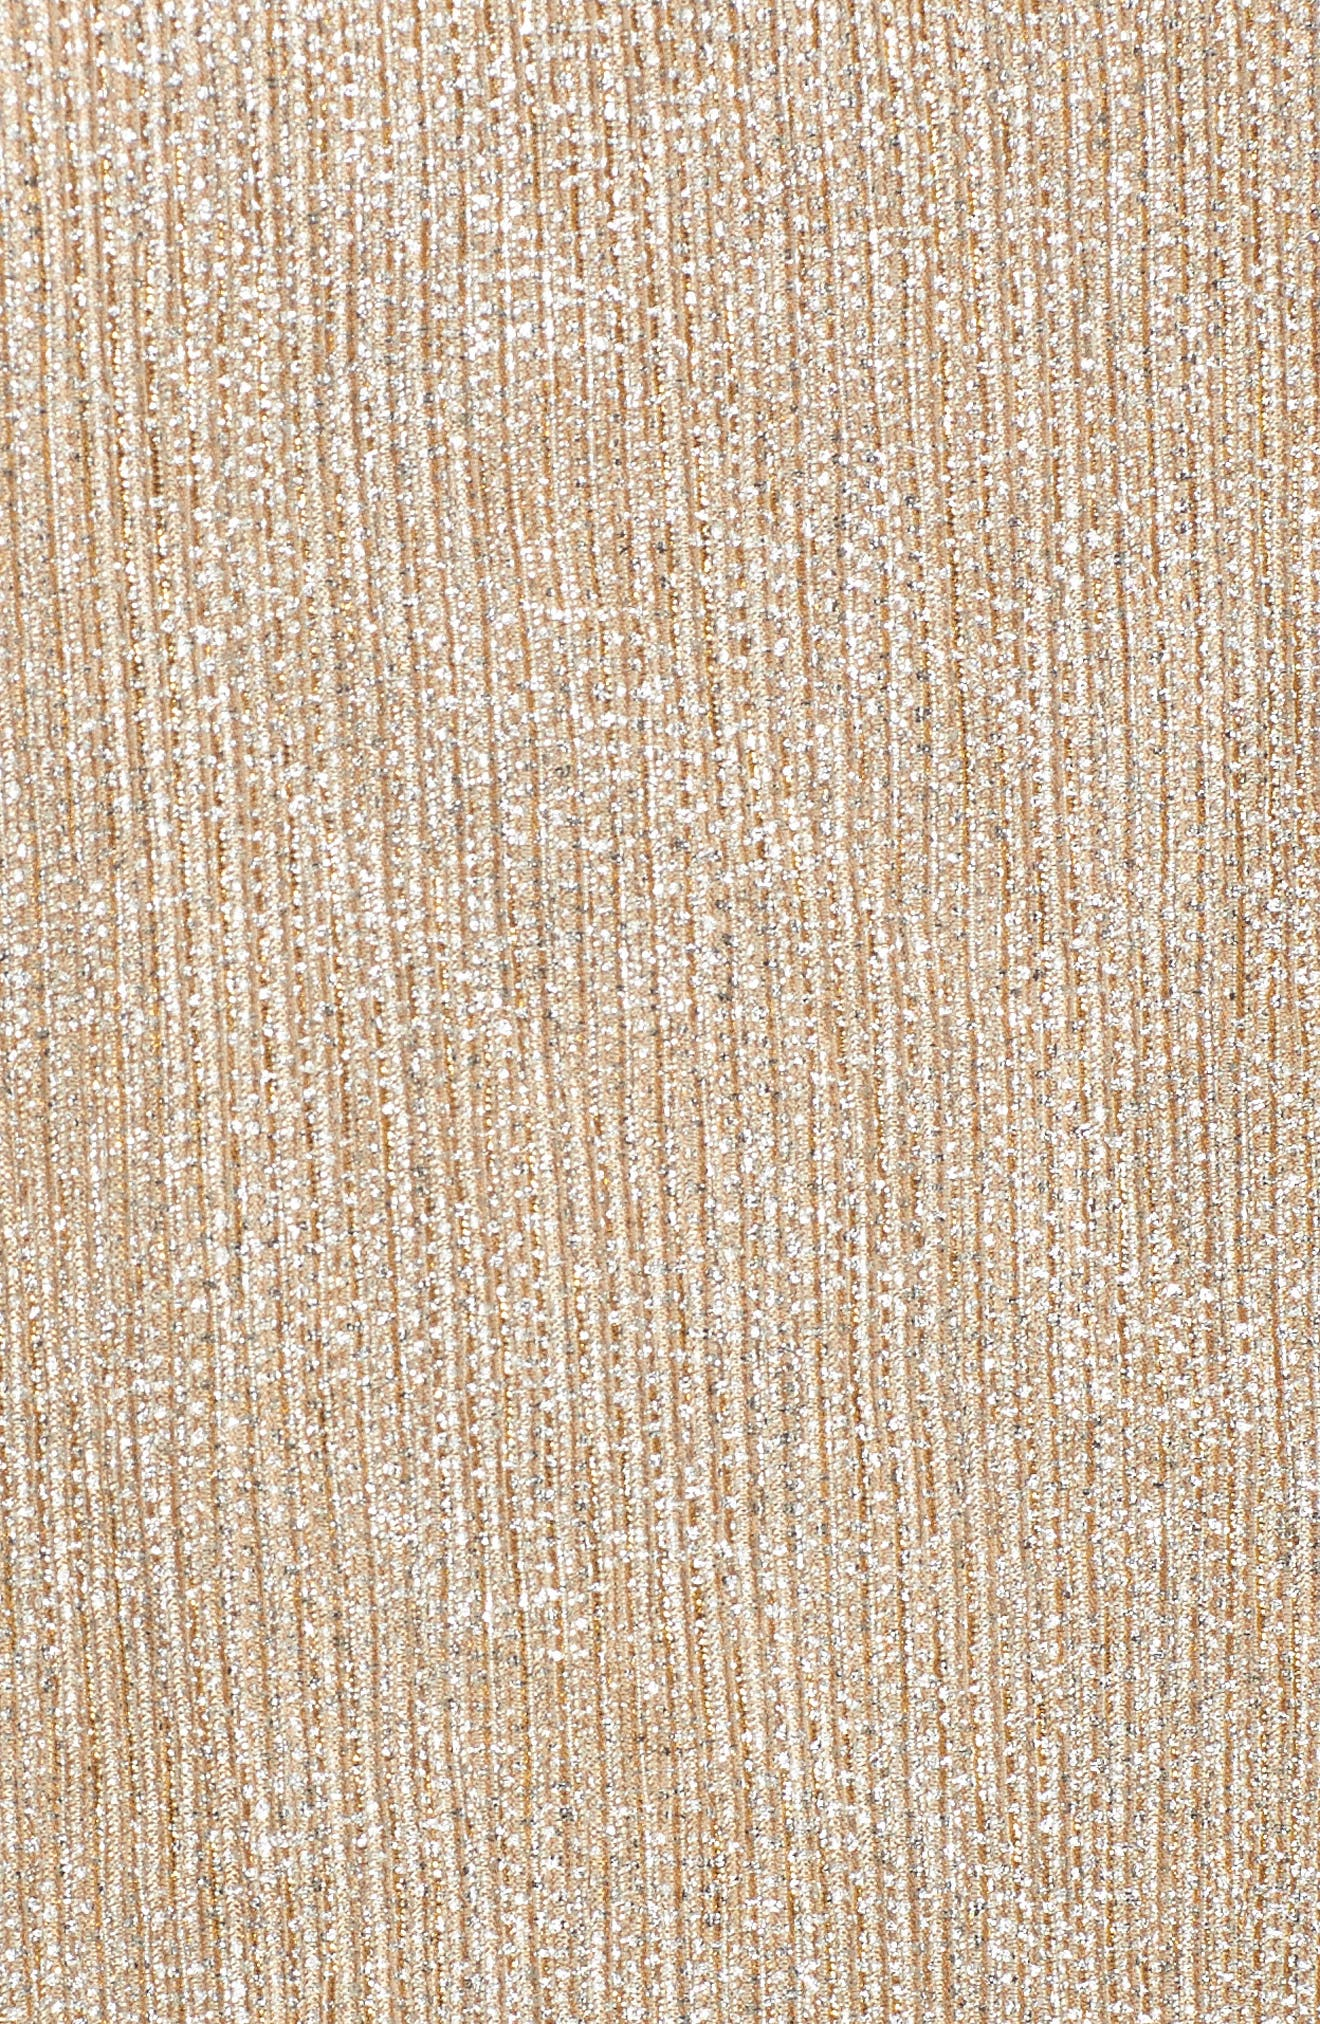 Metallic Knit Tee,                             Alternate thumbnail 5, color,                             274